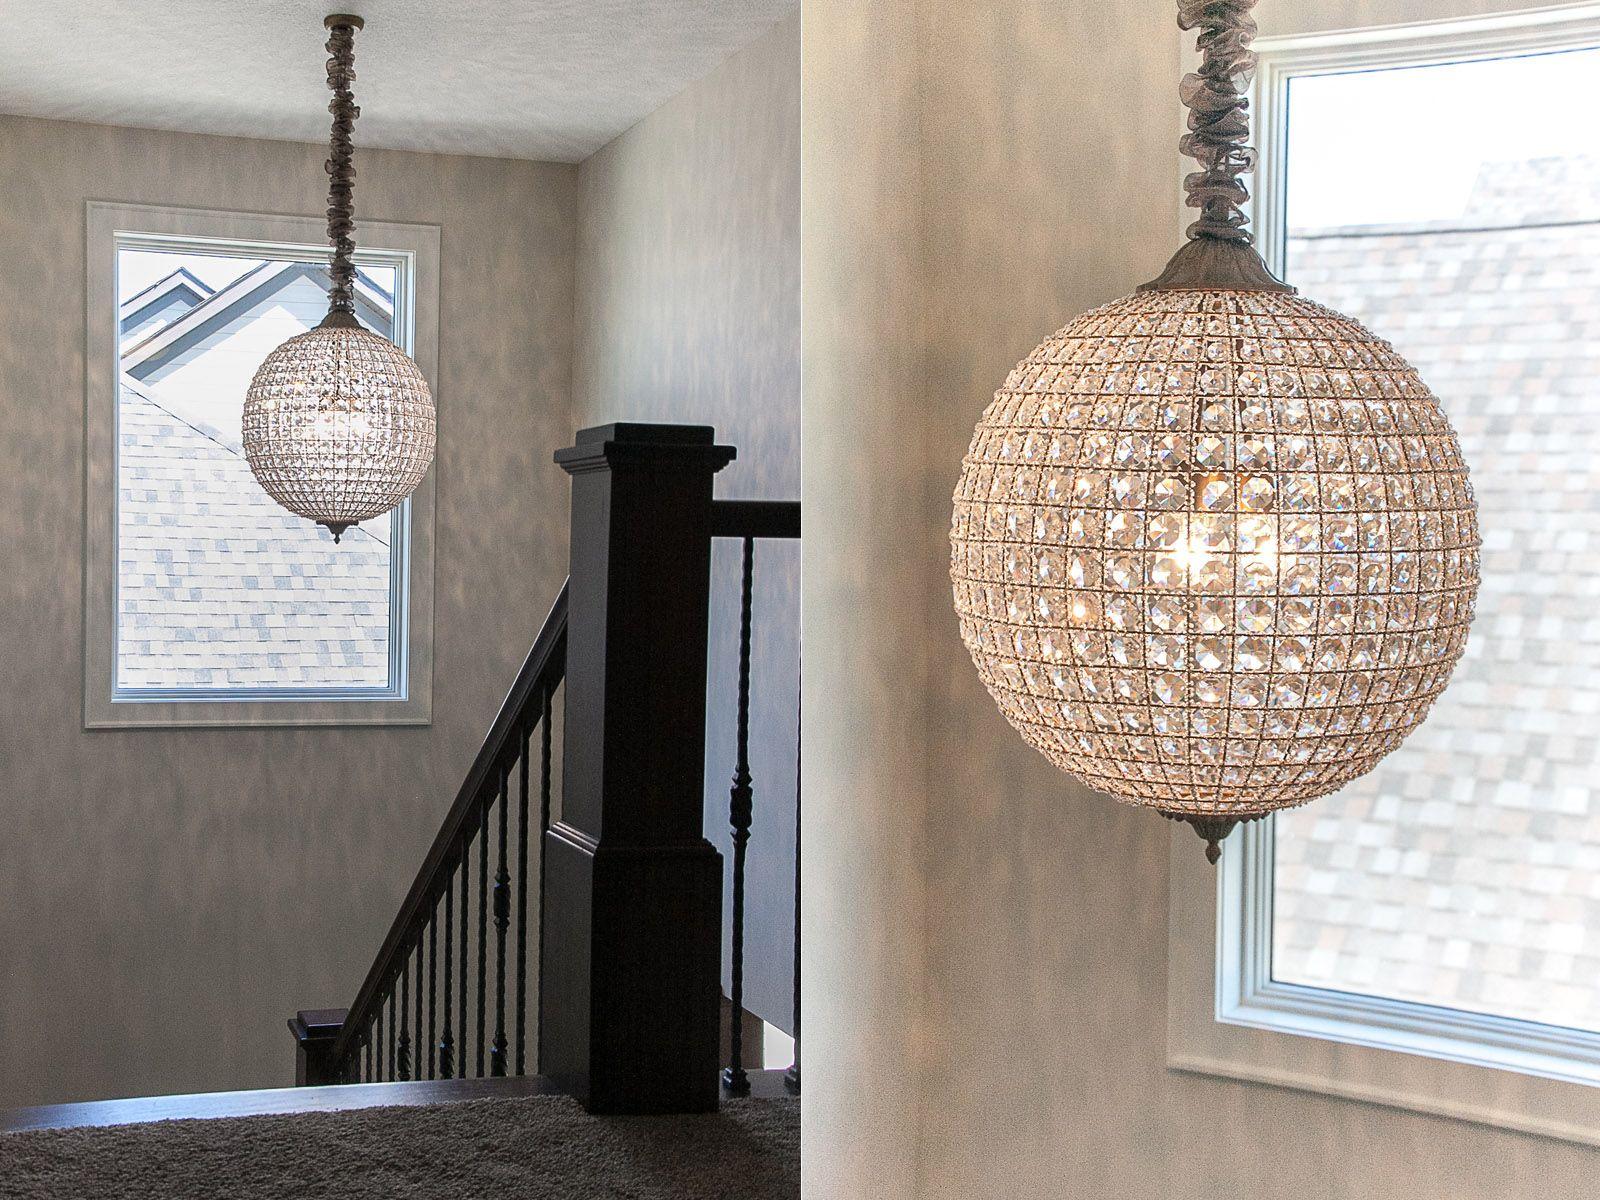 Crystal stairway chandelier chandeliers pinterest custom crystal stairway chandelier arubaitofo Images